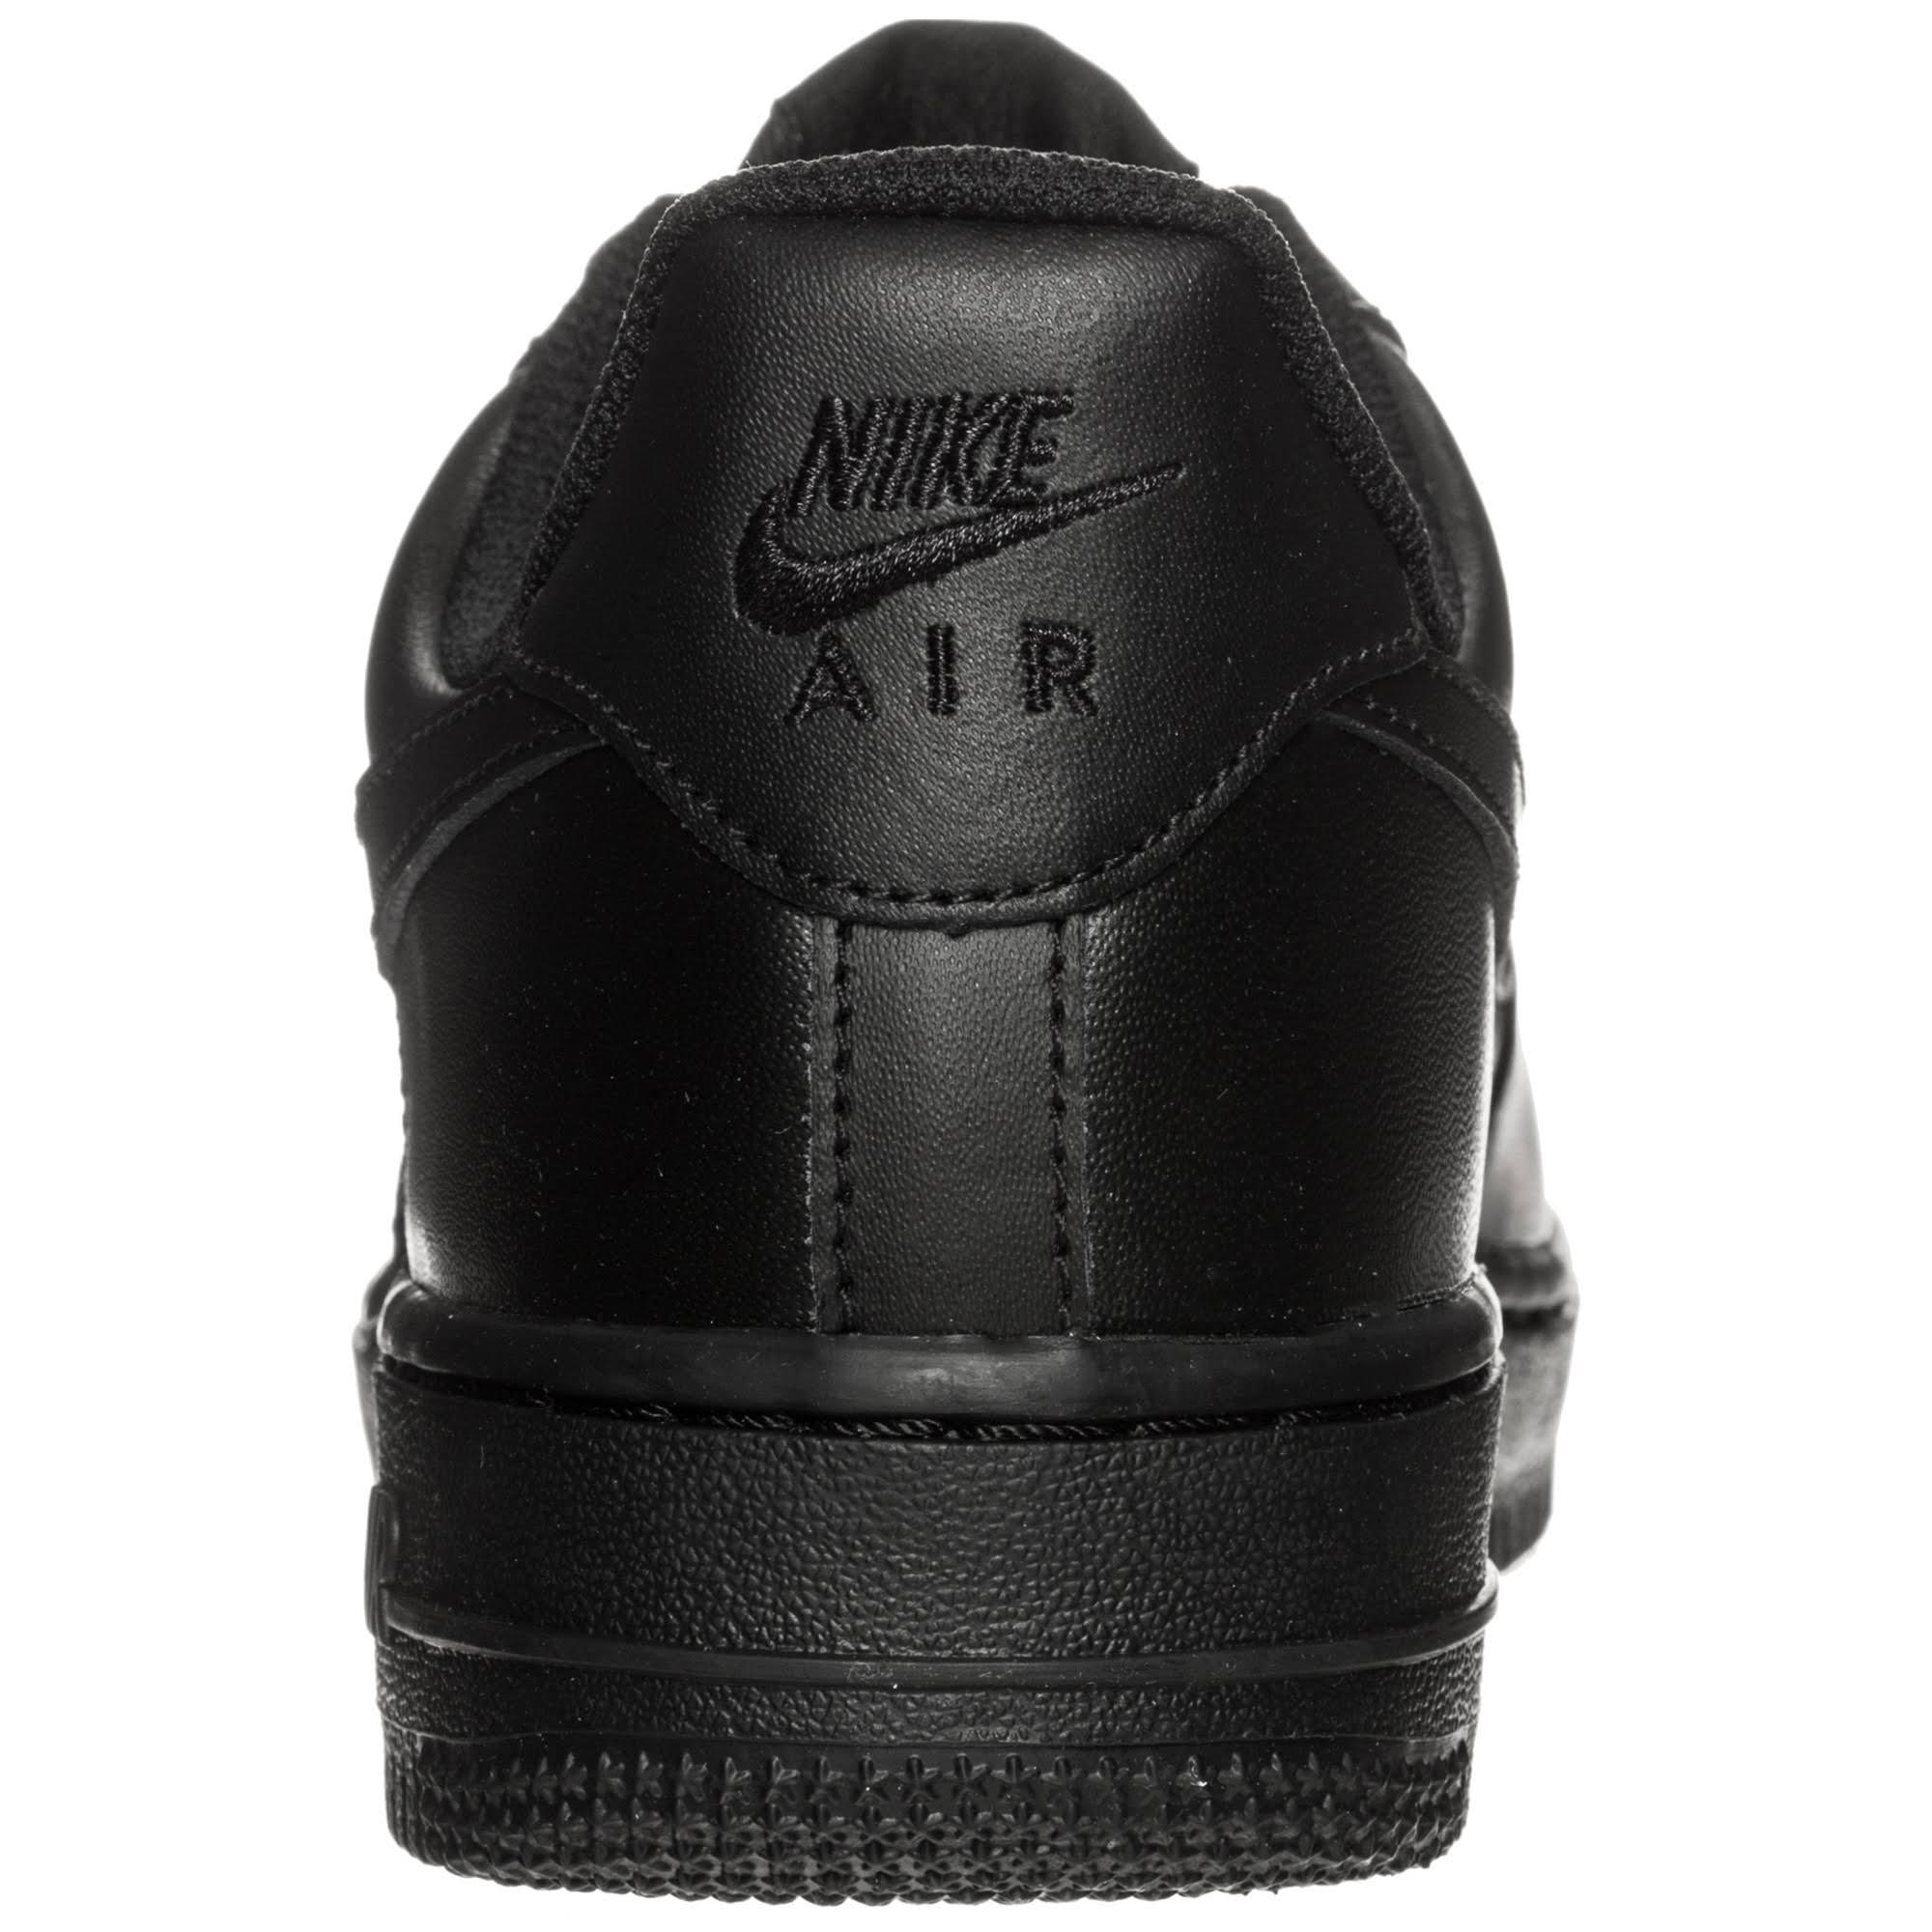 Sportswear 1 Schwarz Nike Sneaker Damen '07 Air blau Force Für Schwarz xOwq6w